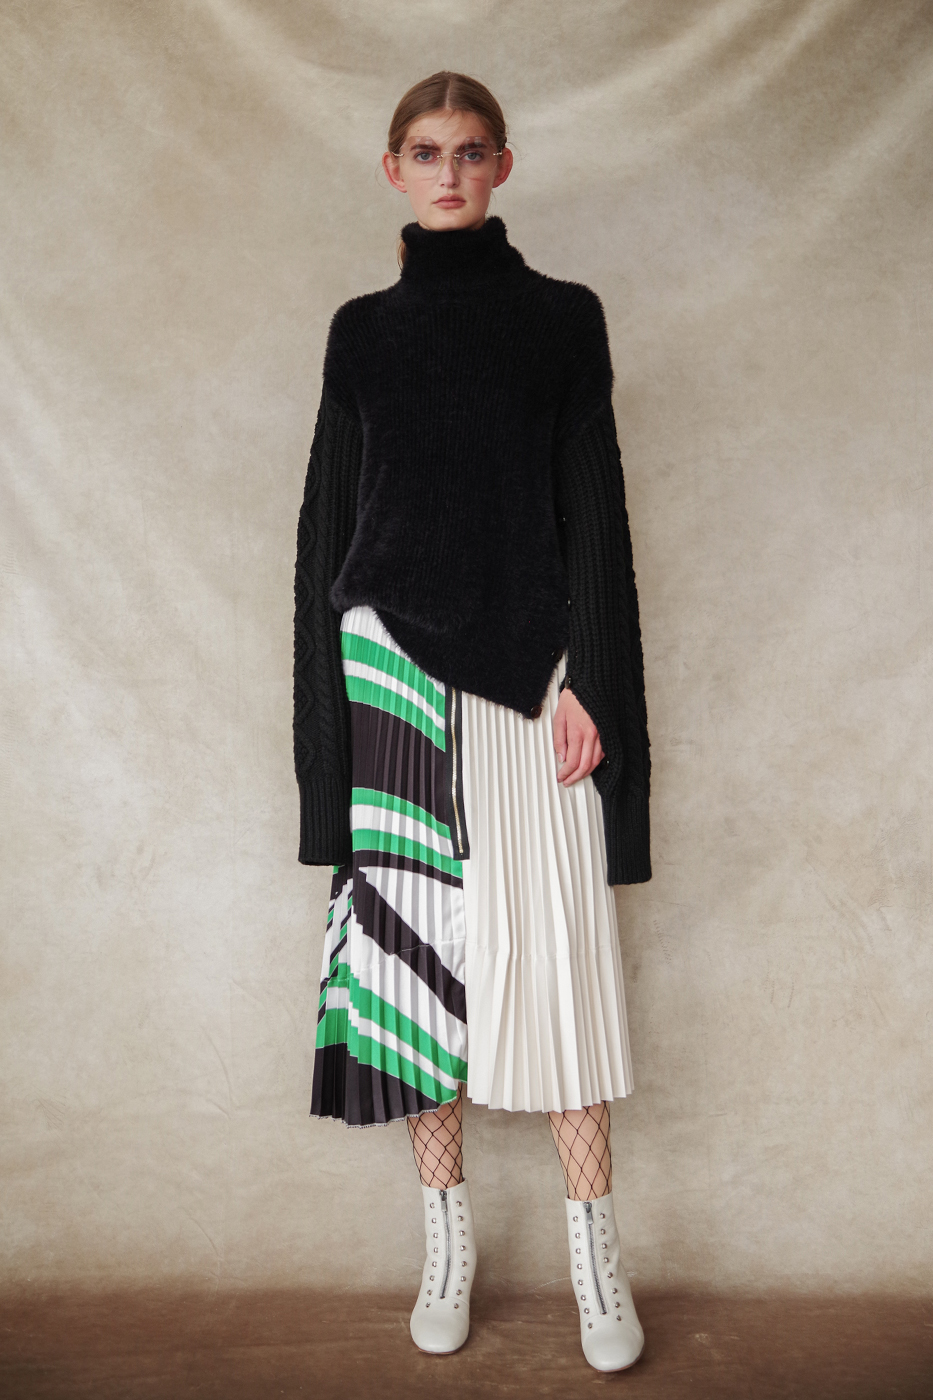 192048 Knit ¥28,000, 192042 Skirt ¥28,000